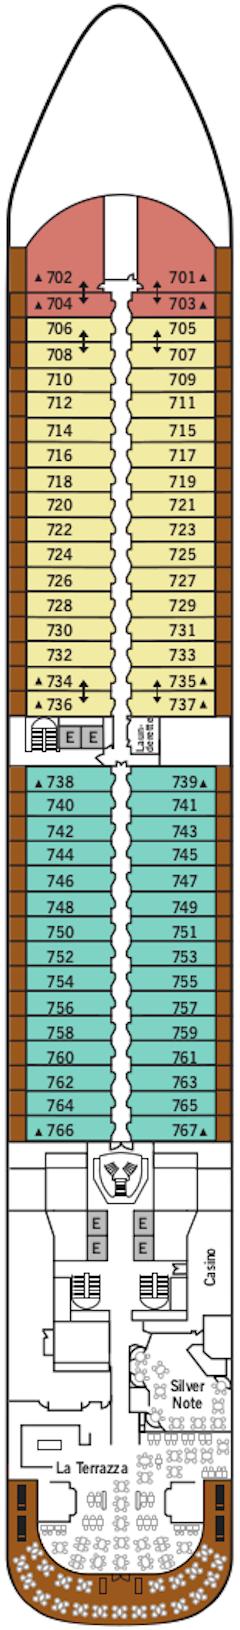 Silver Dawn Deck 7 Deck Plan